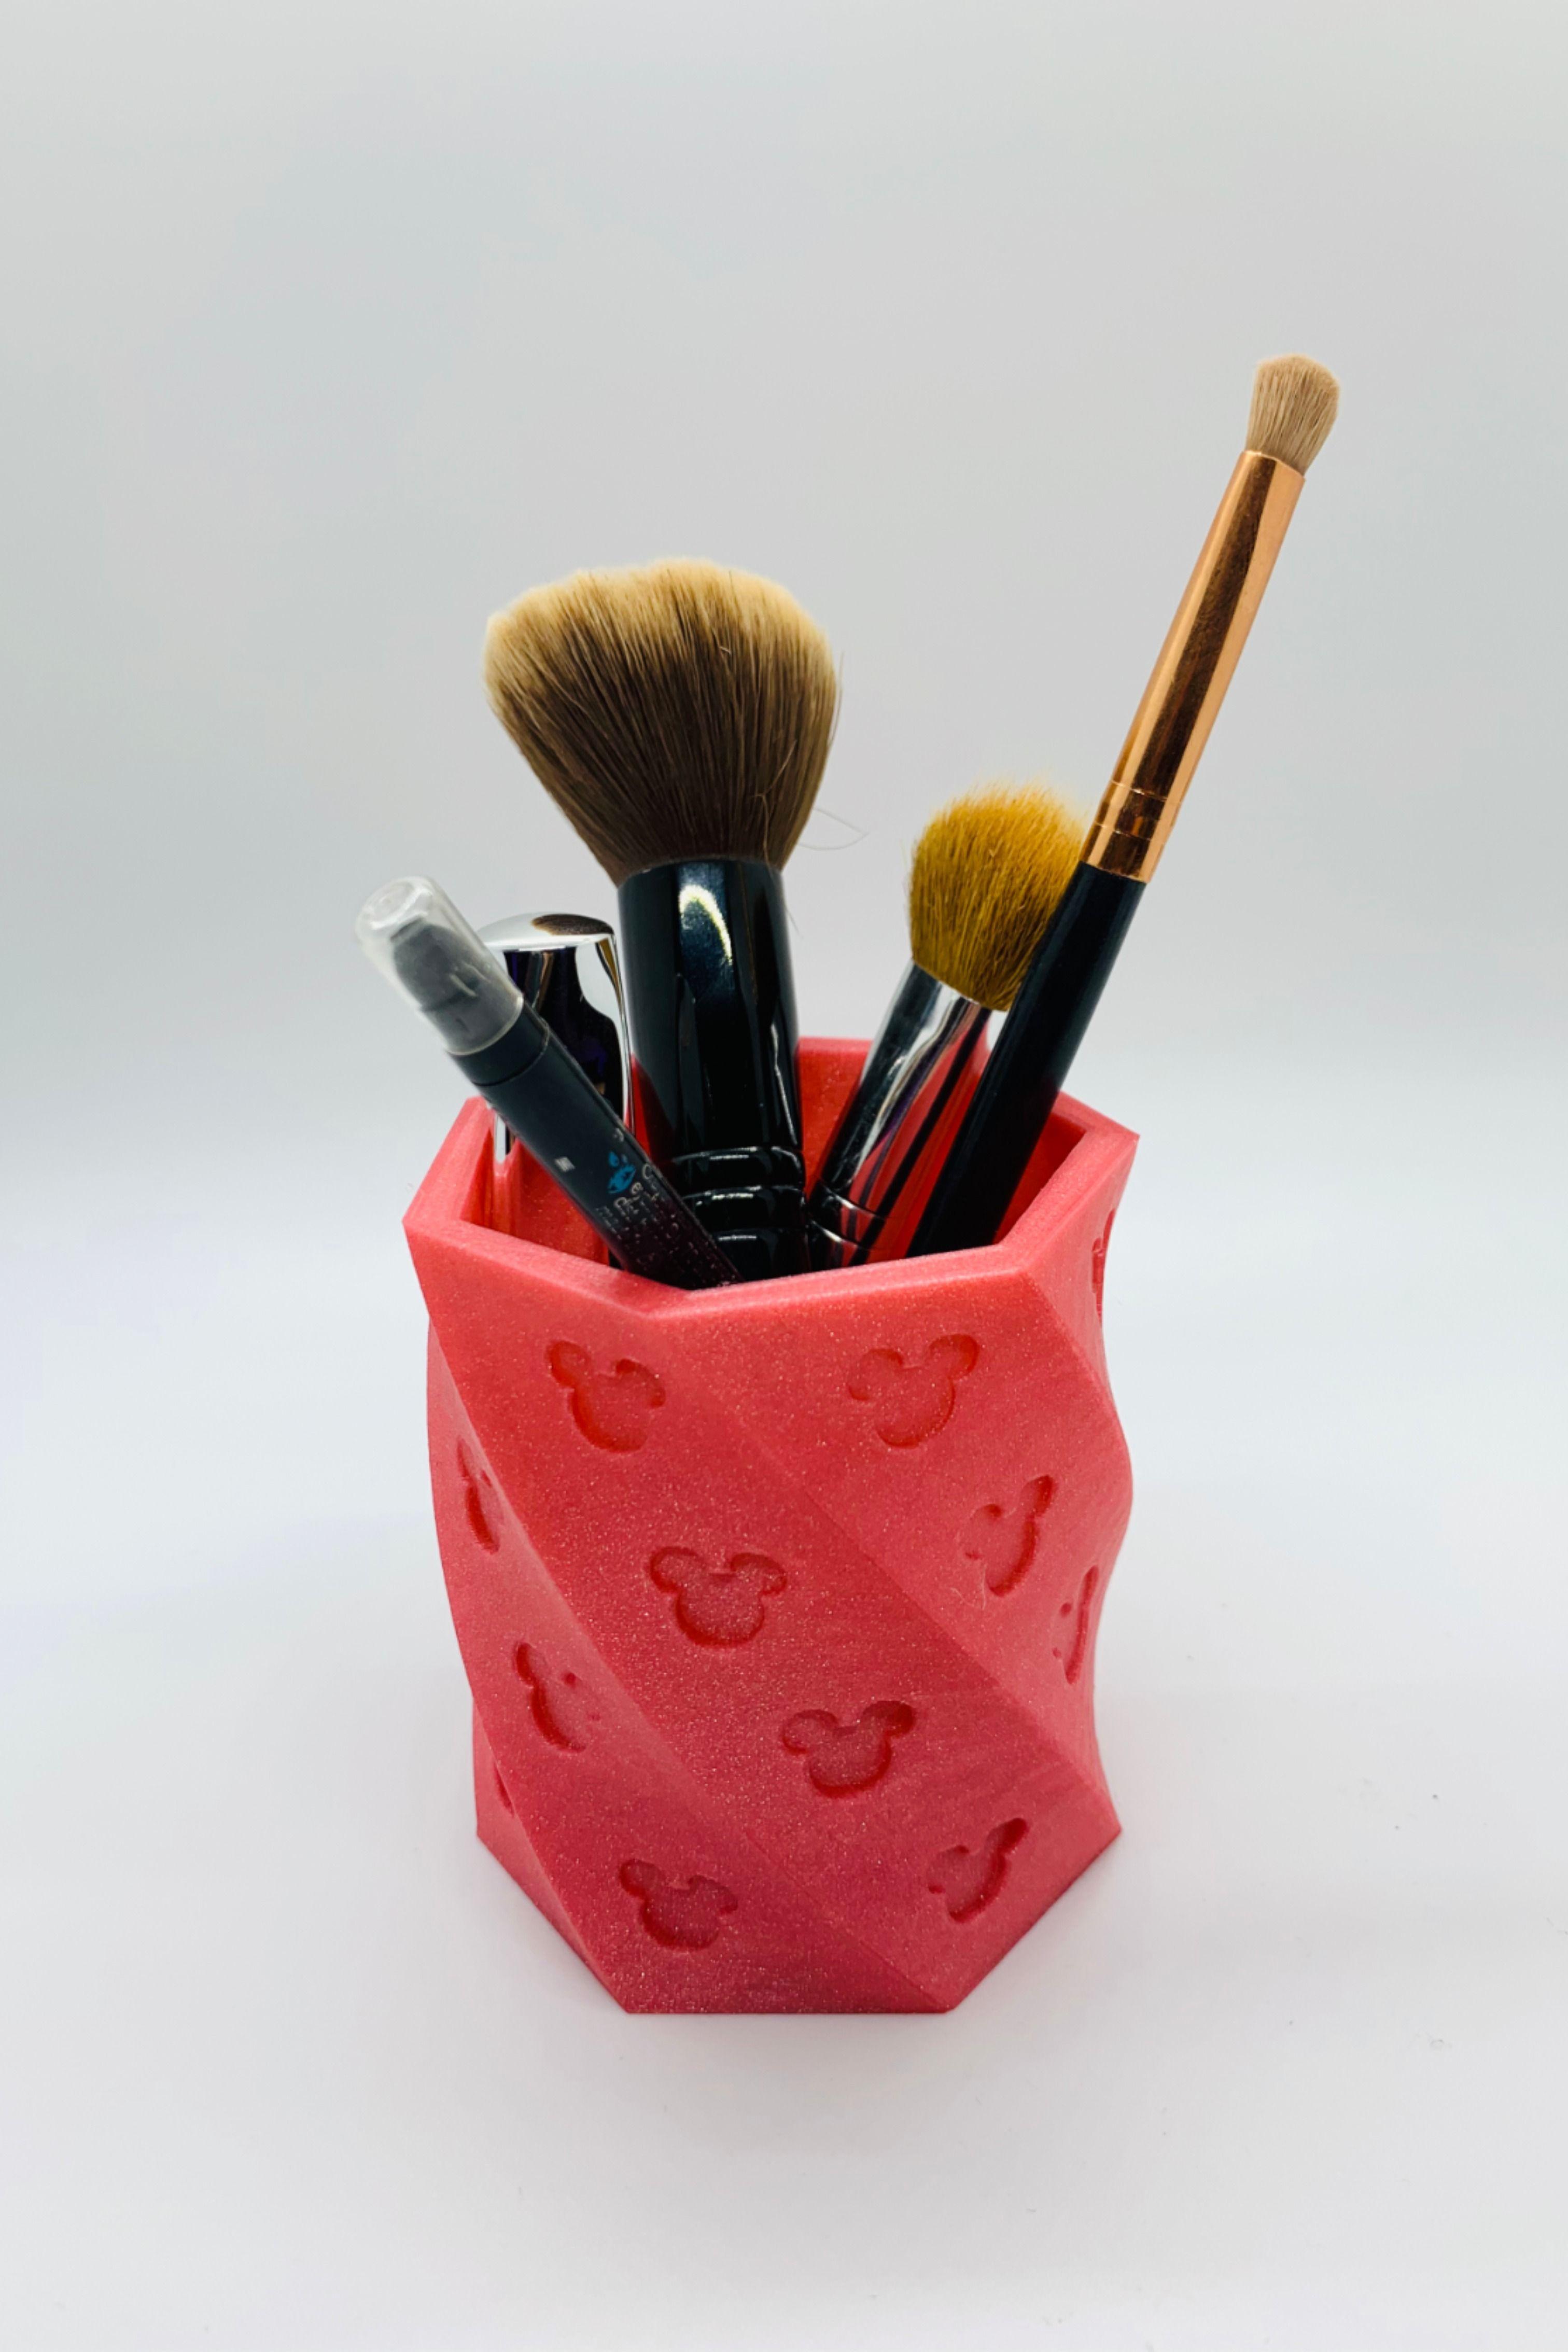 Disney Pen and Pencil Holder Makeup Brush Holder Mickey